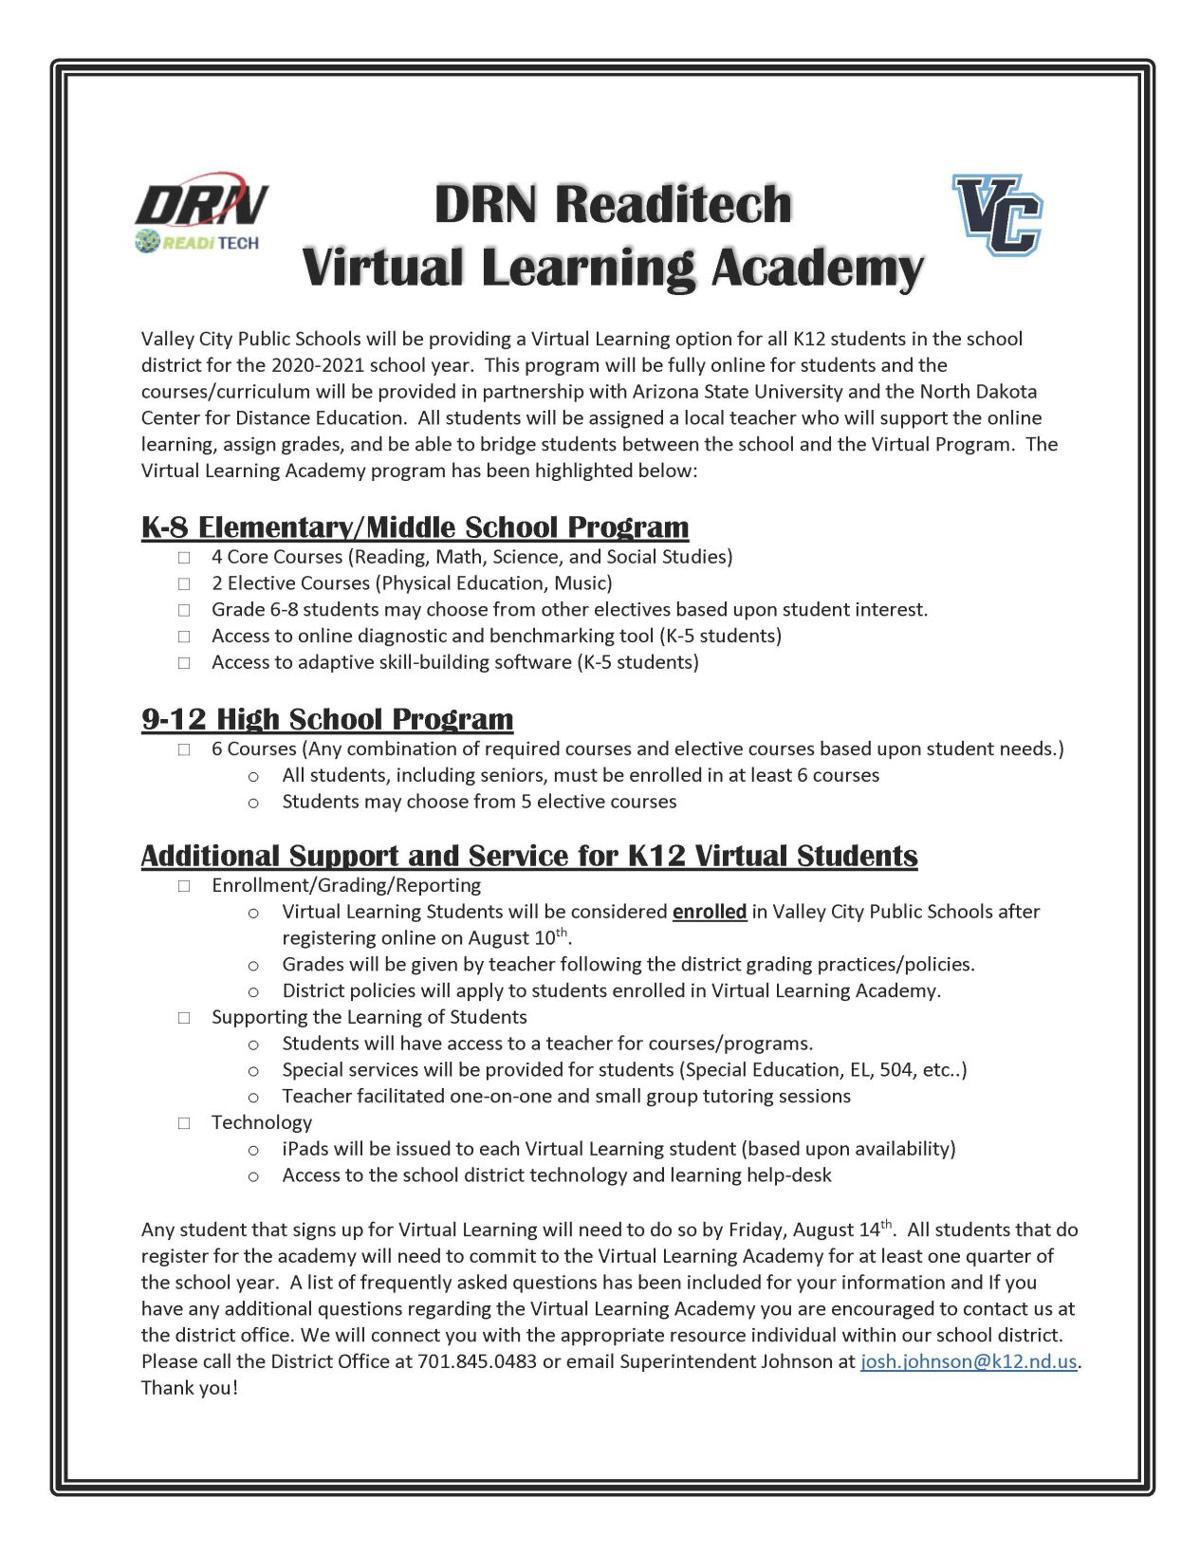 DRN Readitech Virtual Academy (08.03.20)_Page_1.jpg